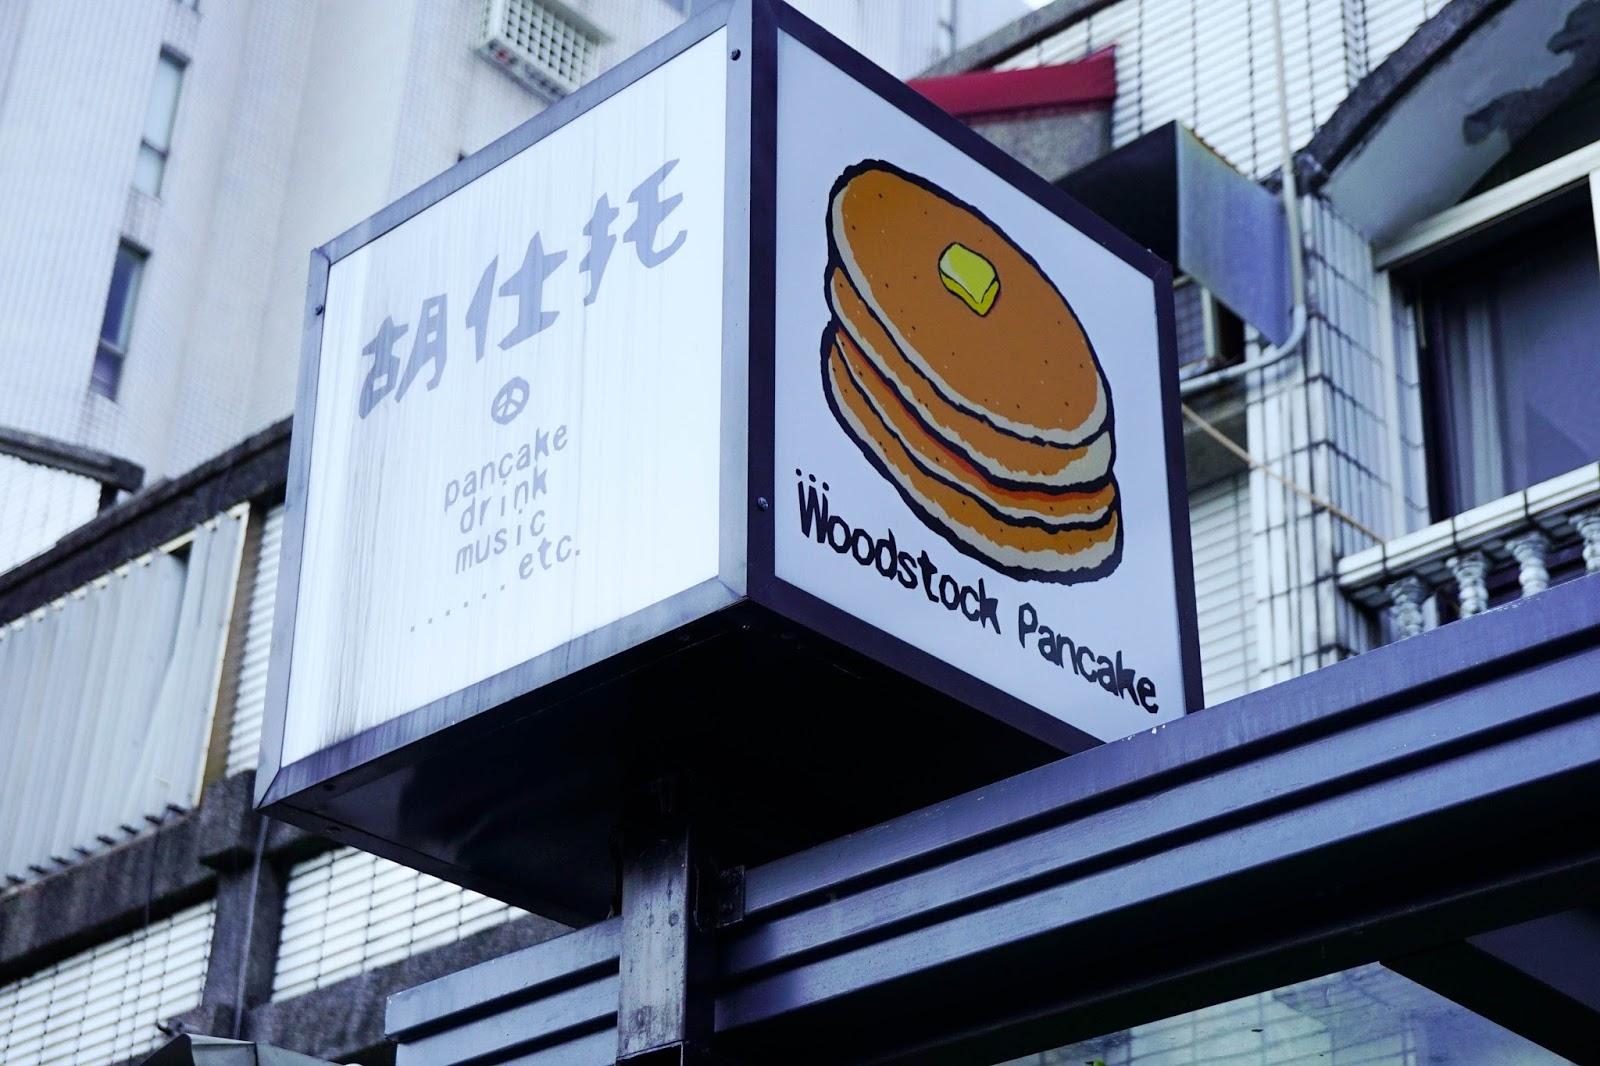 1-hualien-travel-woodstock-pancake-IMG_3597-beautyanxiety.com-hualien-desserts-woodstock-pancake